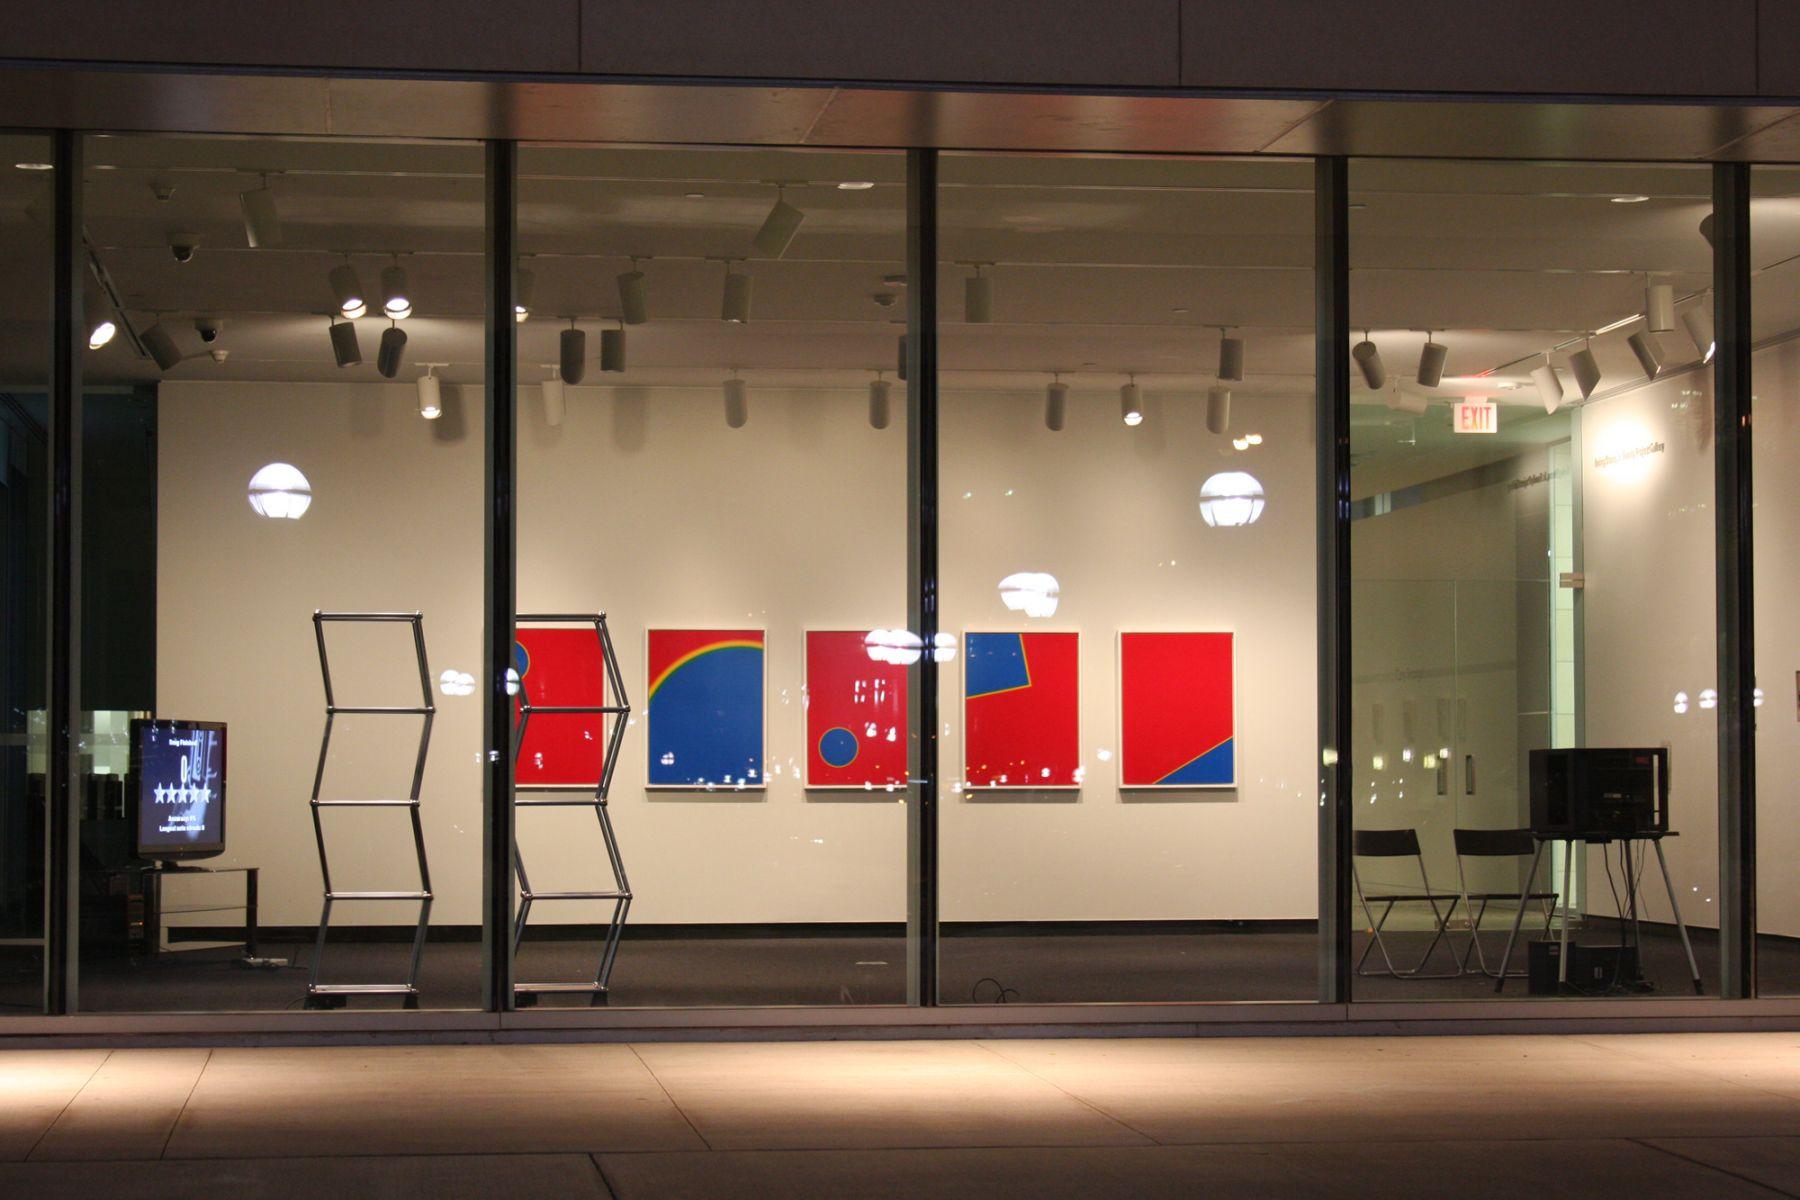 Cory Arcangel, Installation view,Creative Pursuits, University of Michigan Museum of Art, Ann Arbor, 2010